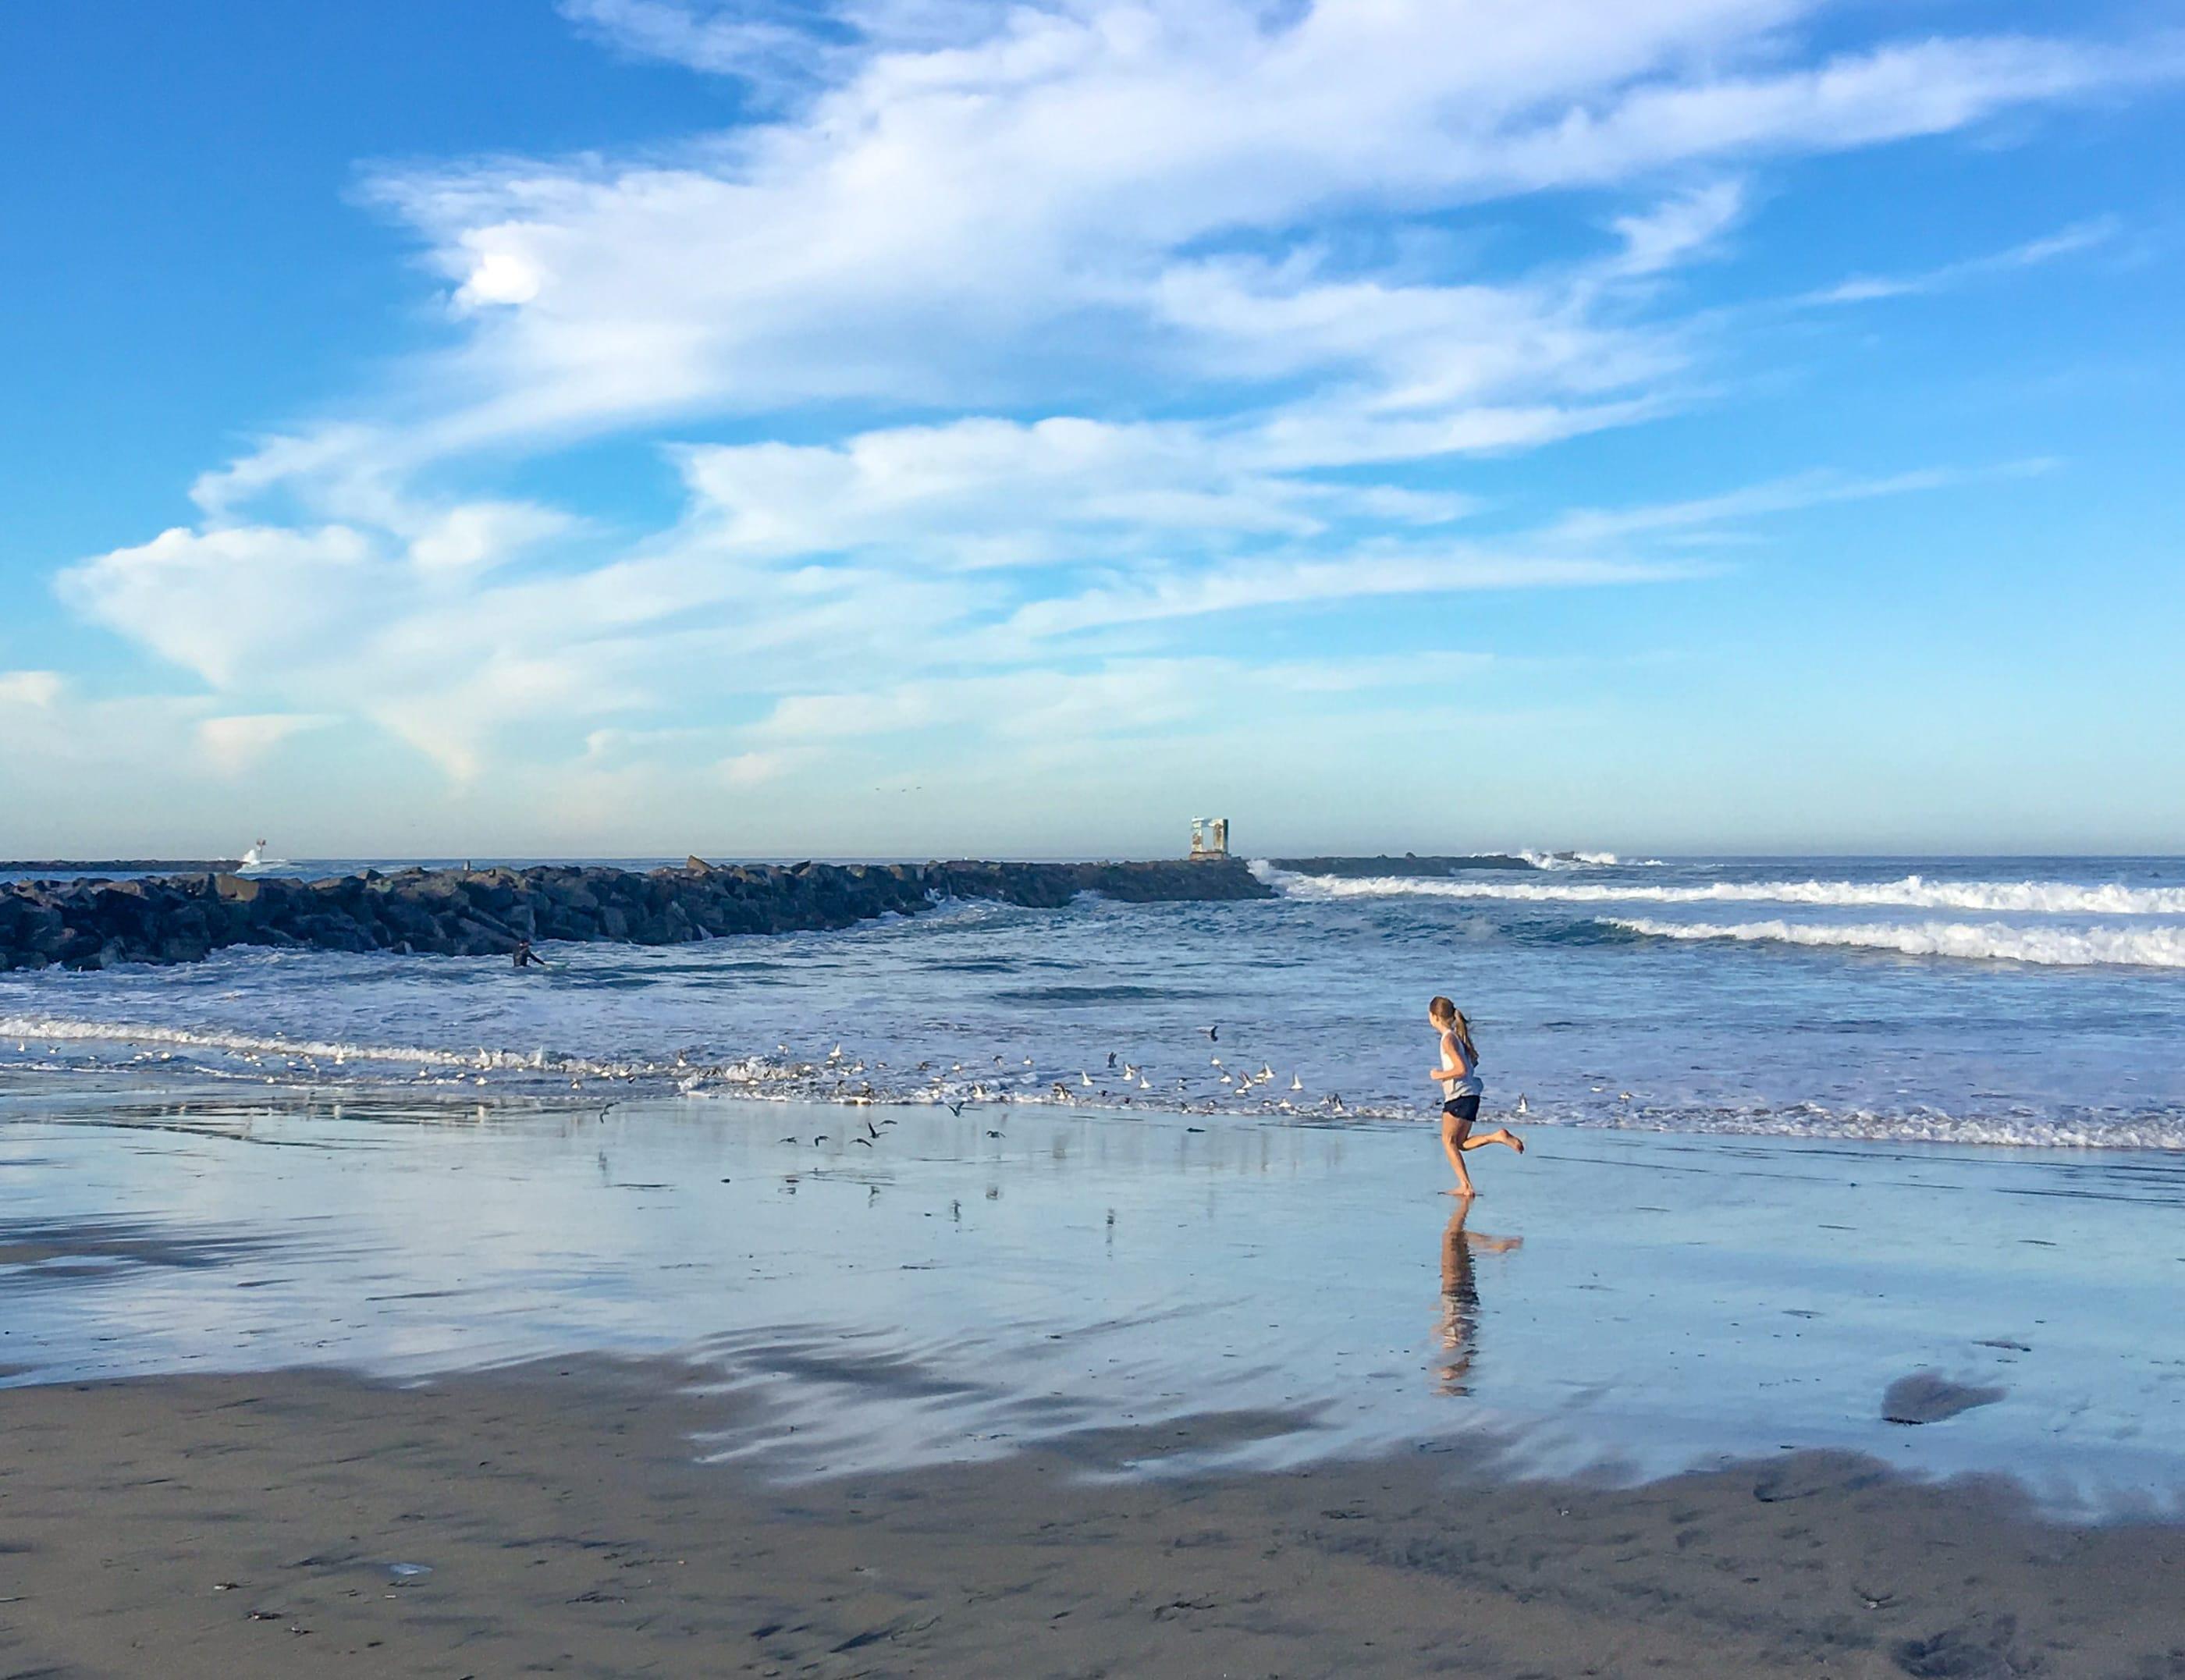 Mission Beach jetty